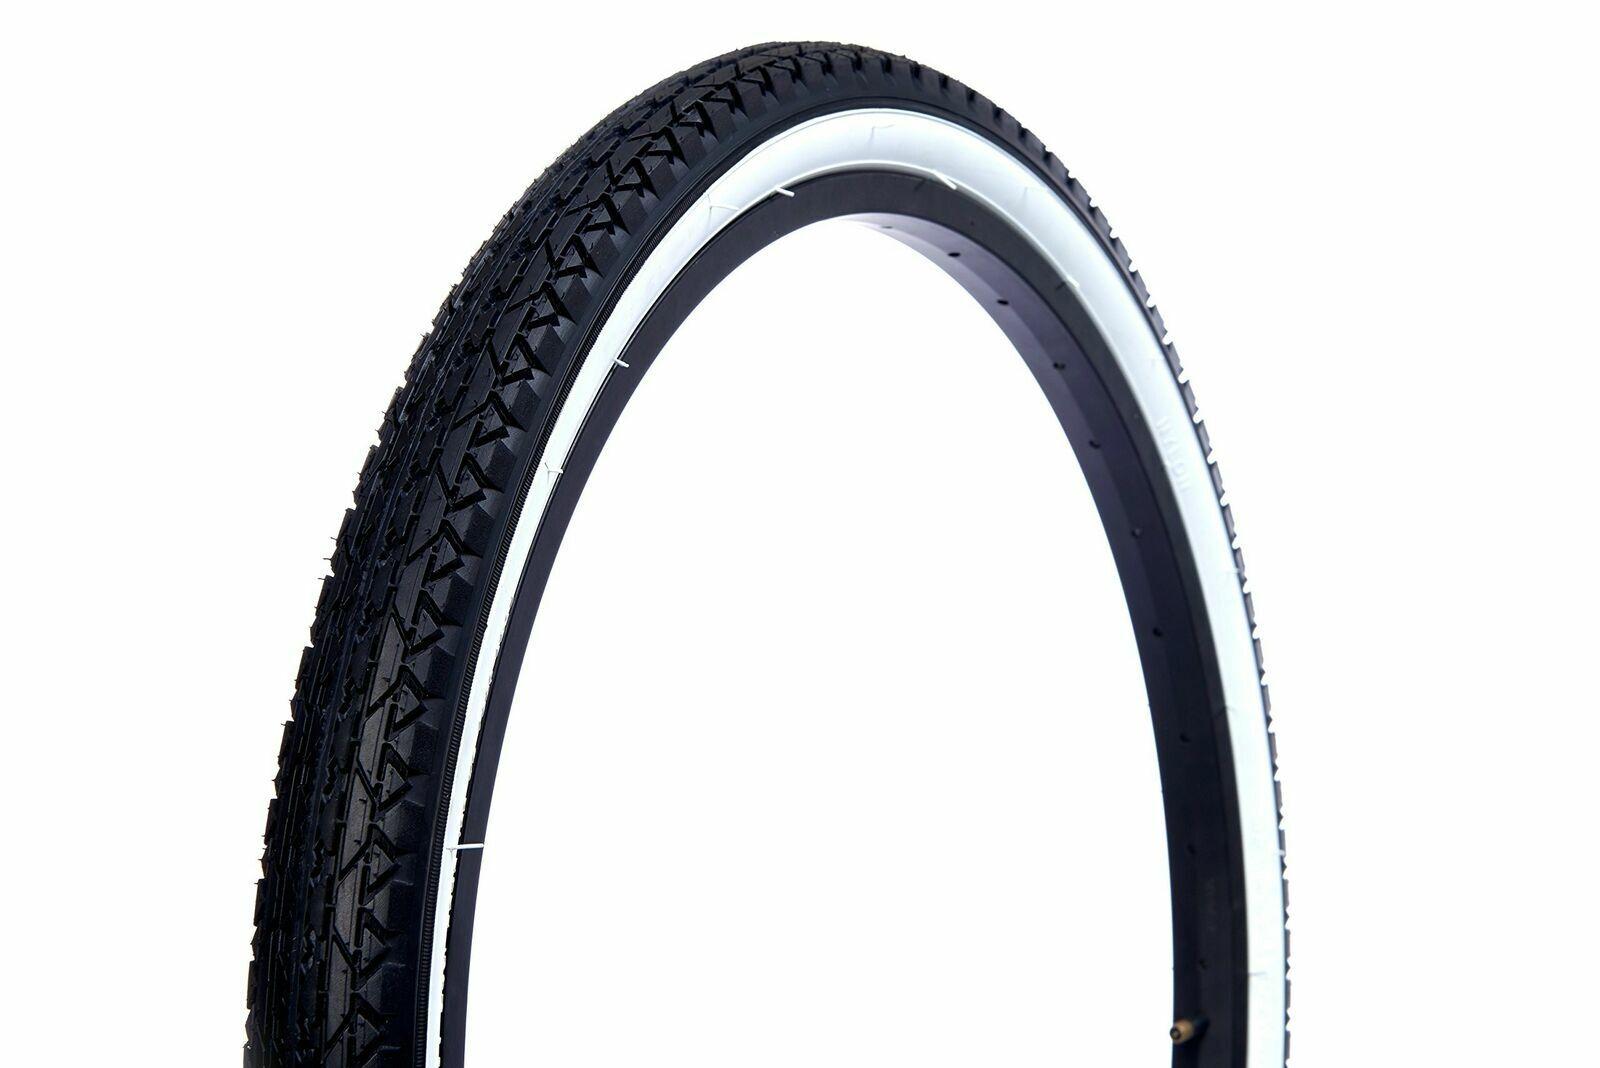 Wanda Beach Cruiser Tires, 26 inch x 2.125 Black with W